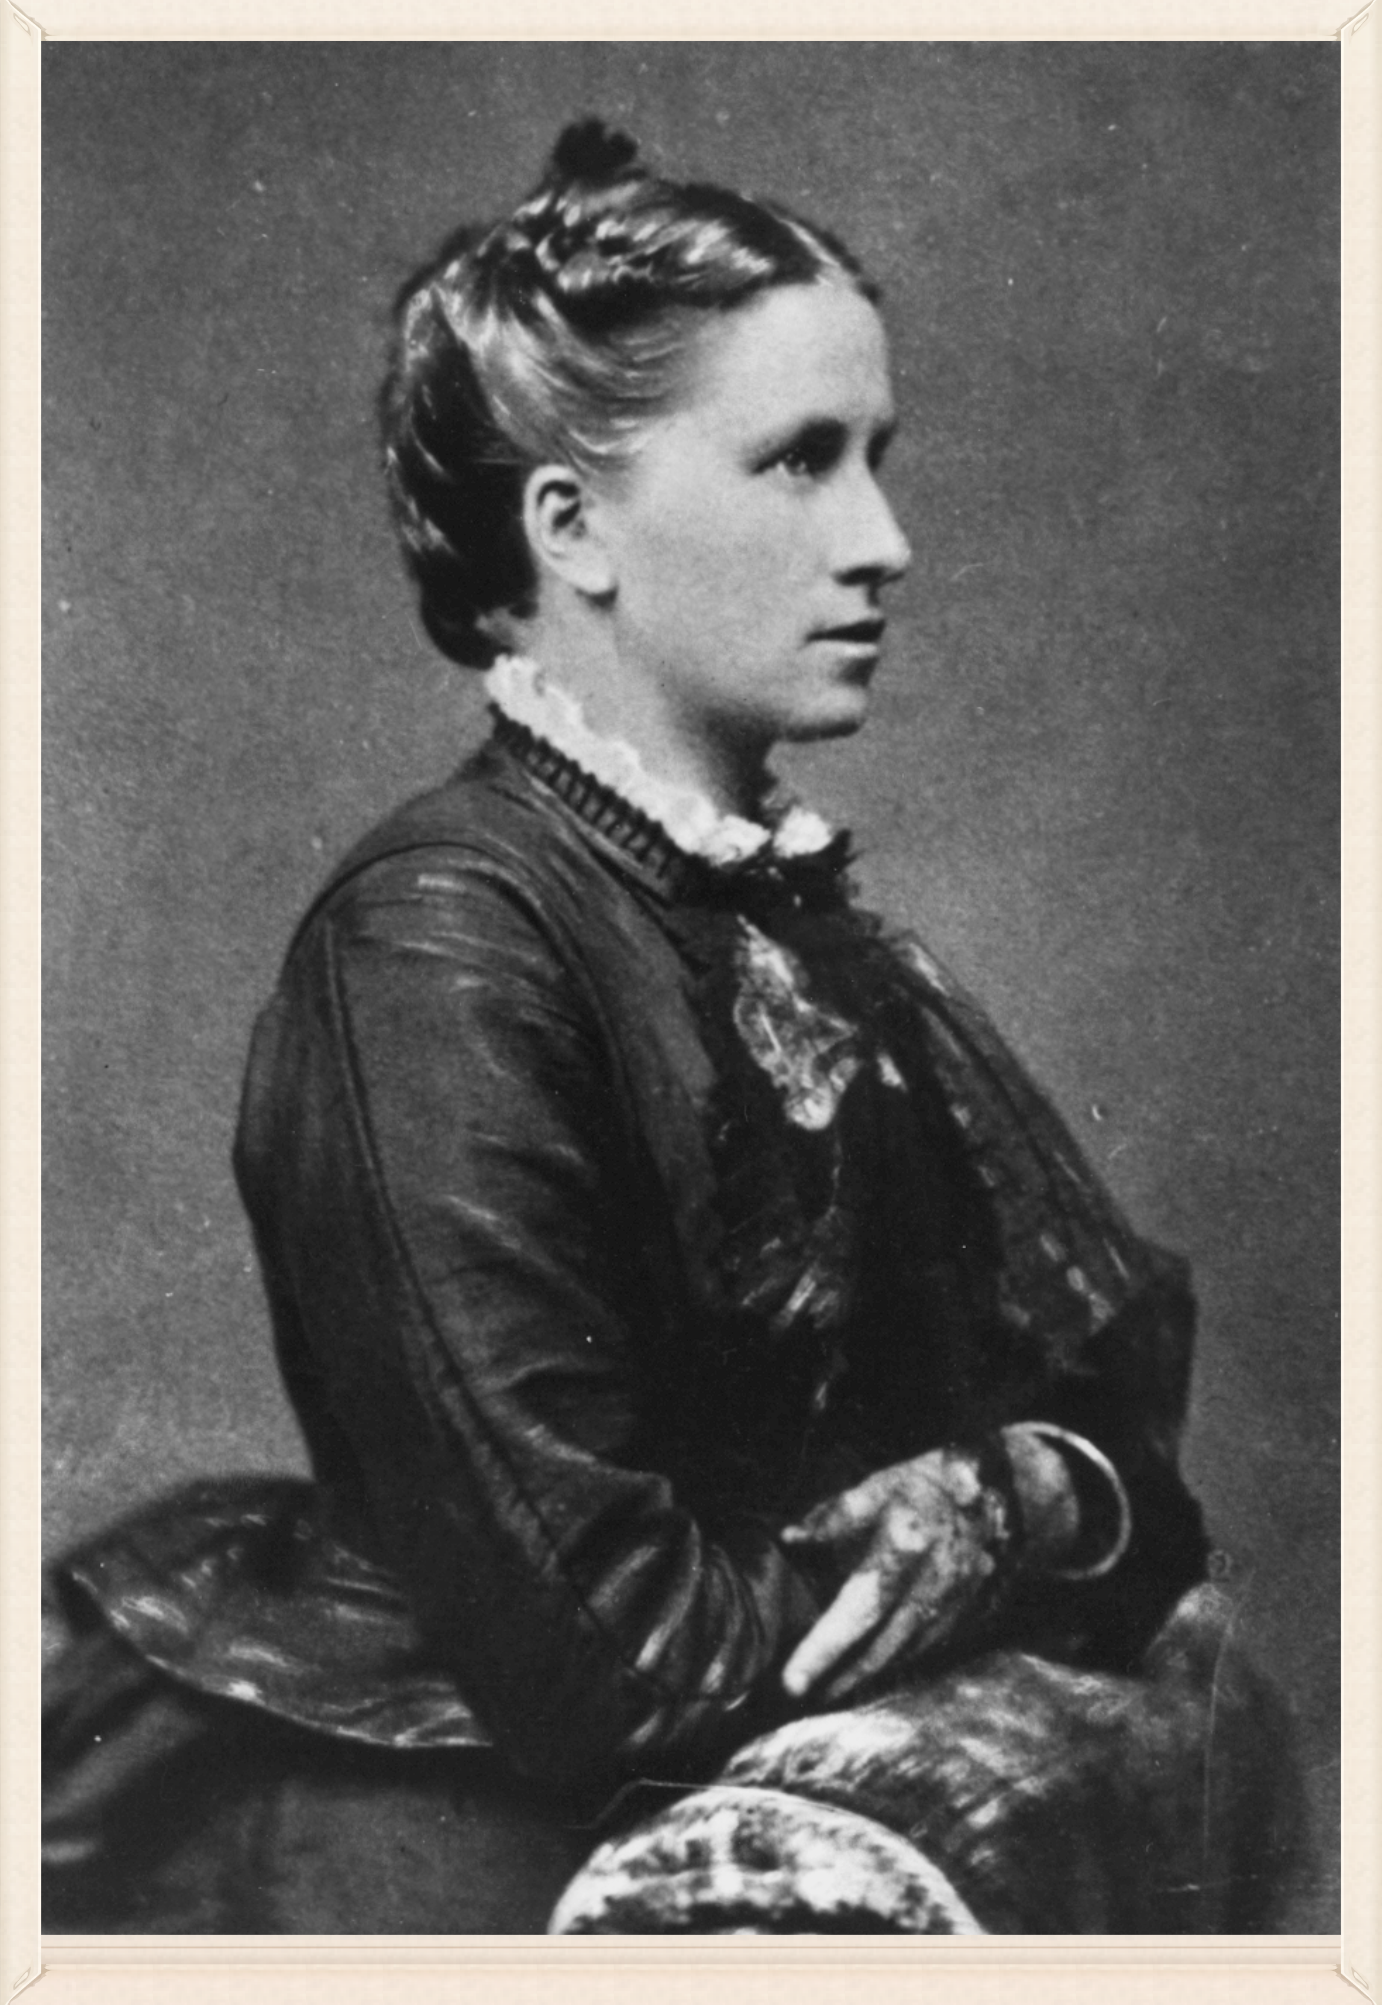 Kathryn A. Dunning